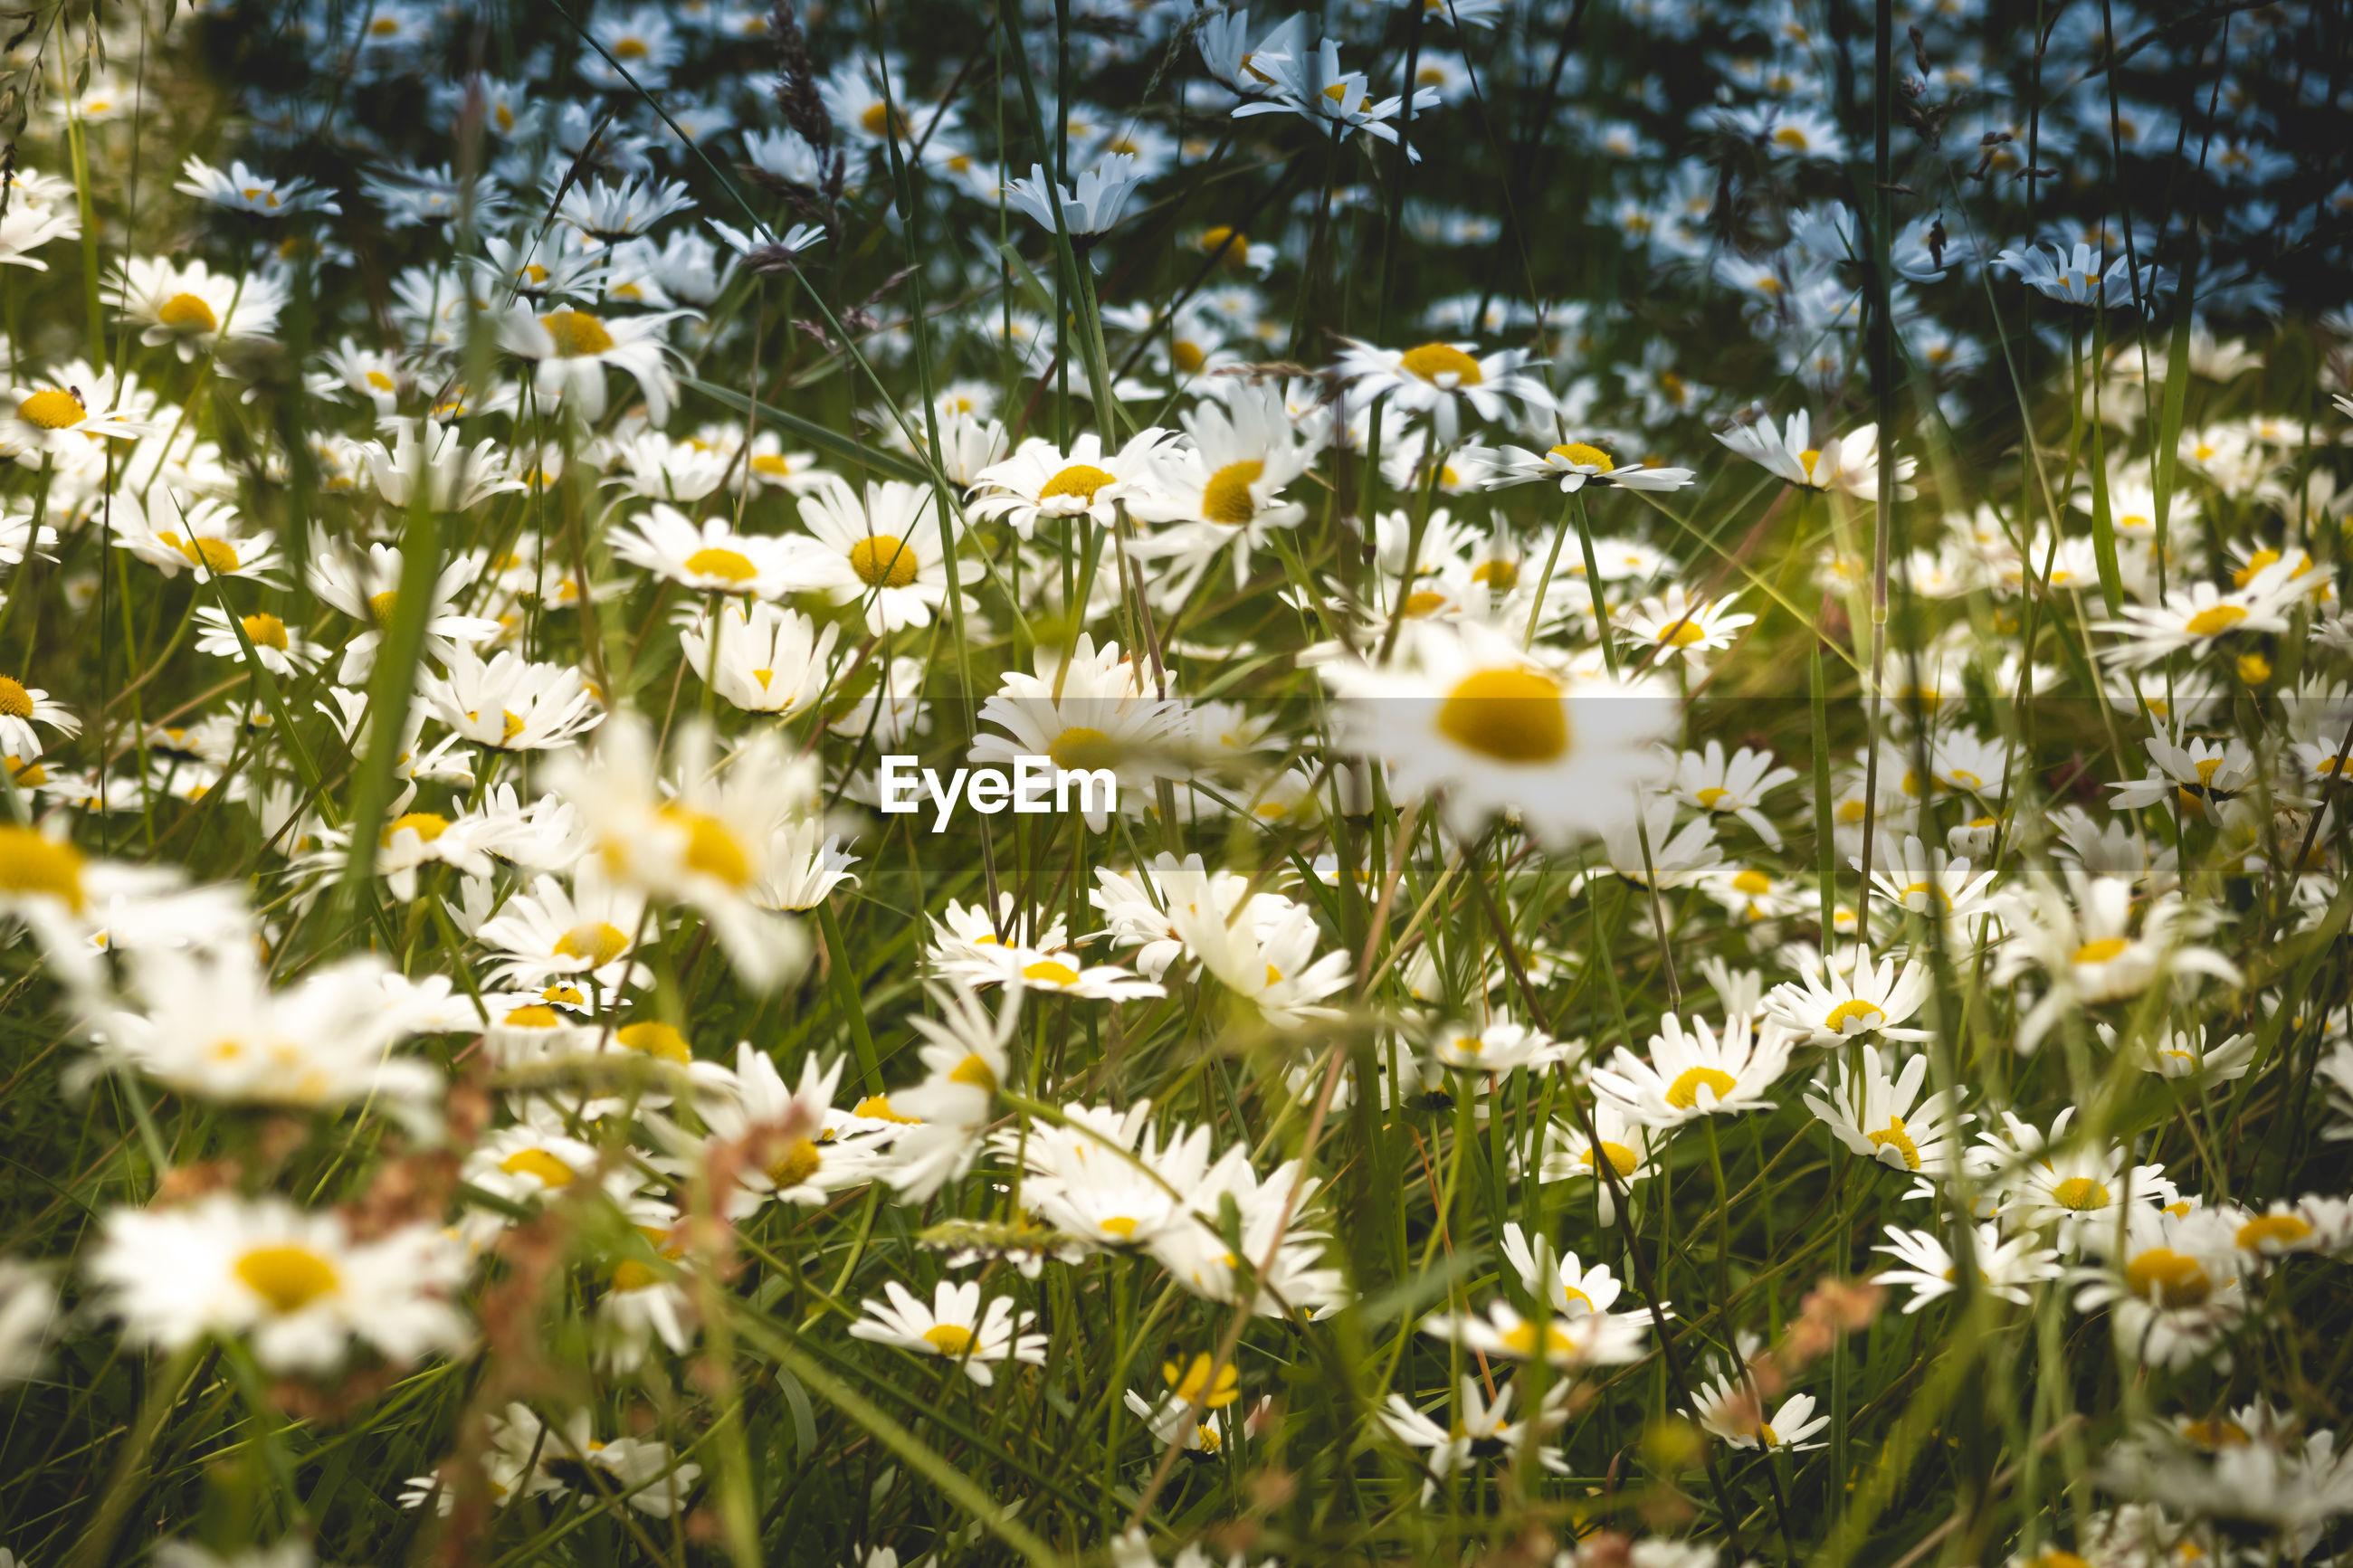 CLOSE-UP OF FRESH WHITE DAISY FLOWERS